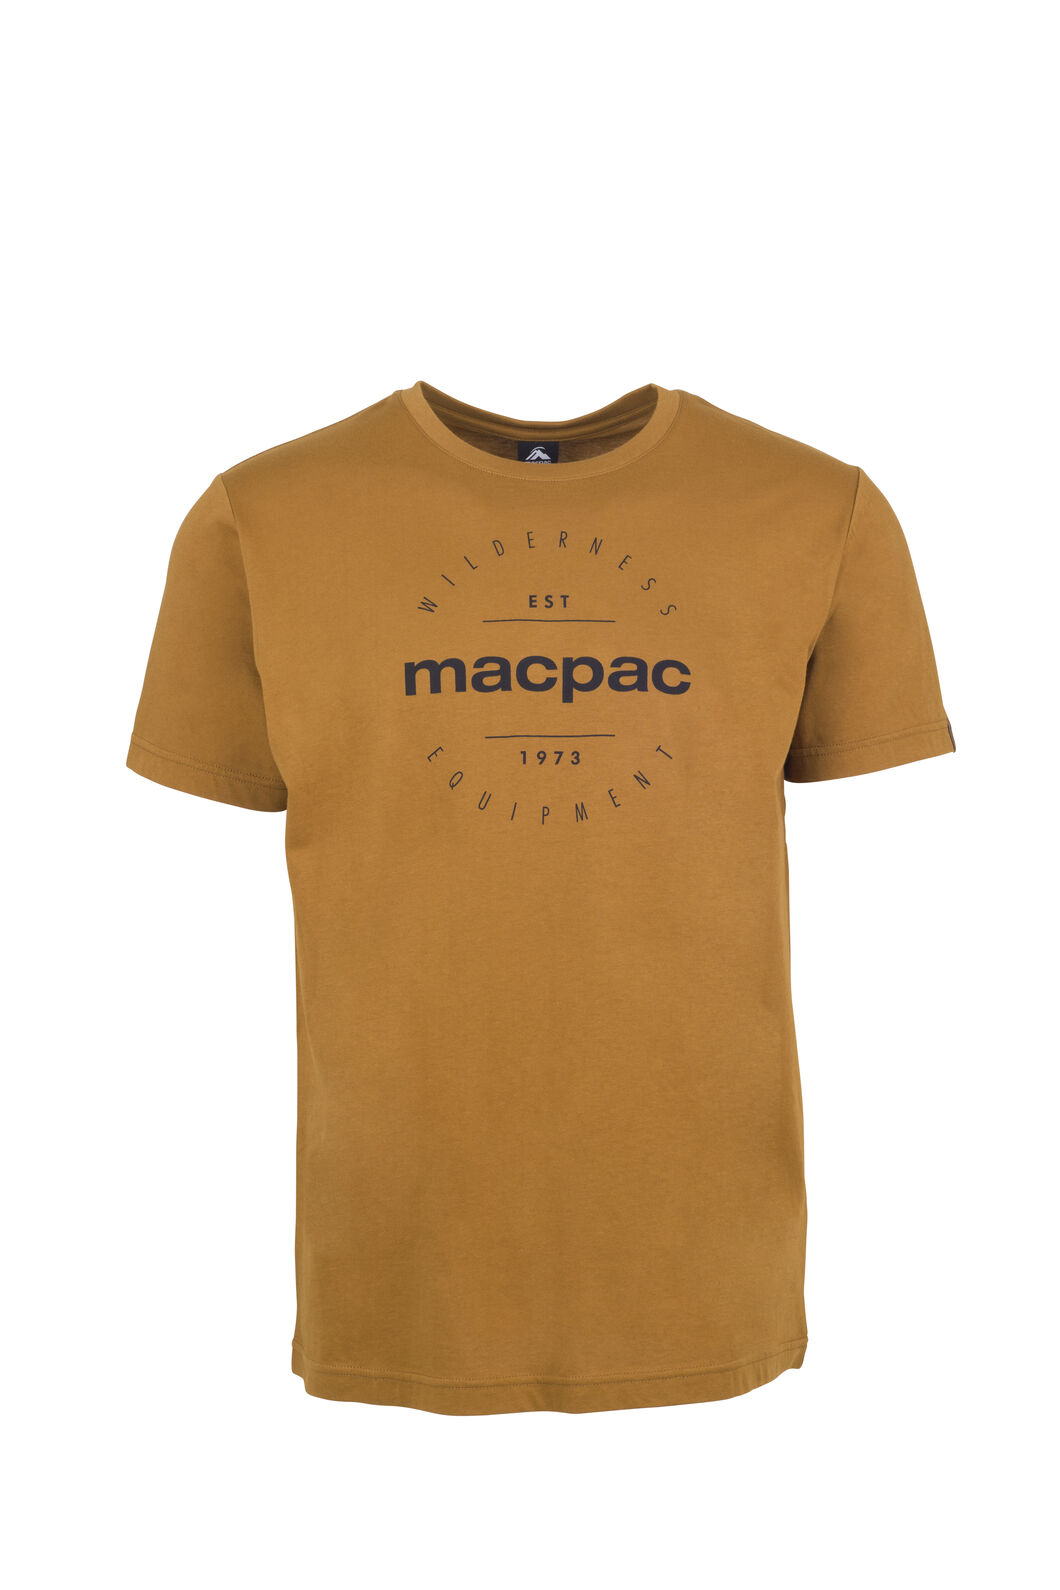 Macpac Stamp Organic Cotton Tee - Men's, Bronze Brown, hi-res